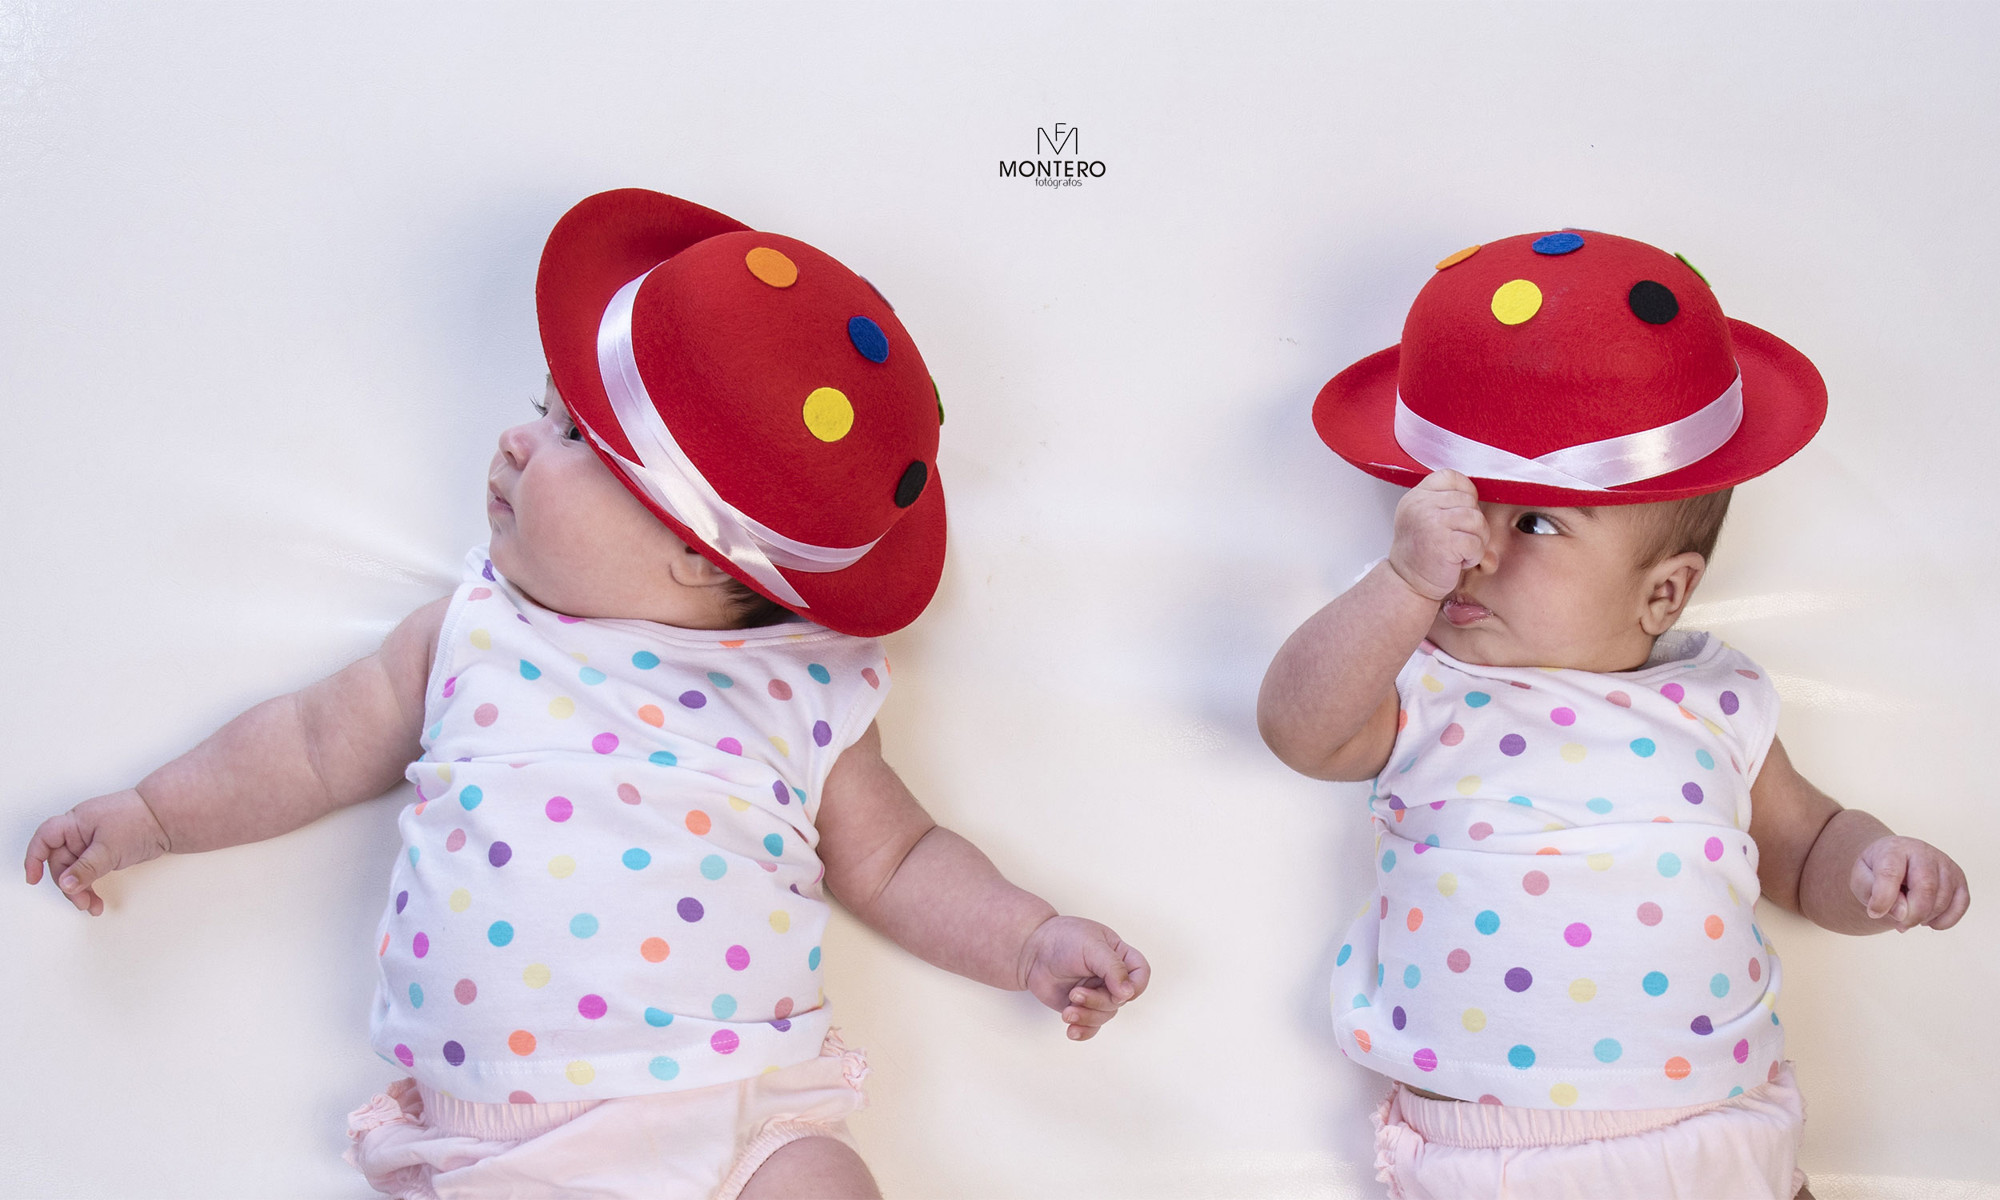 Sesiones fotográficas de bebés